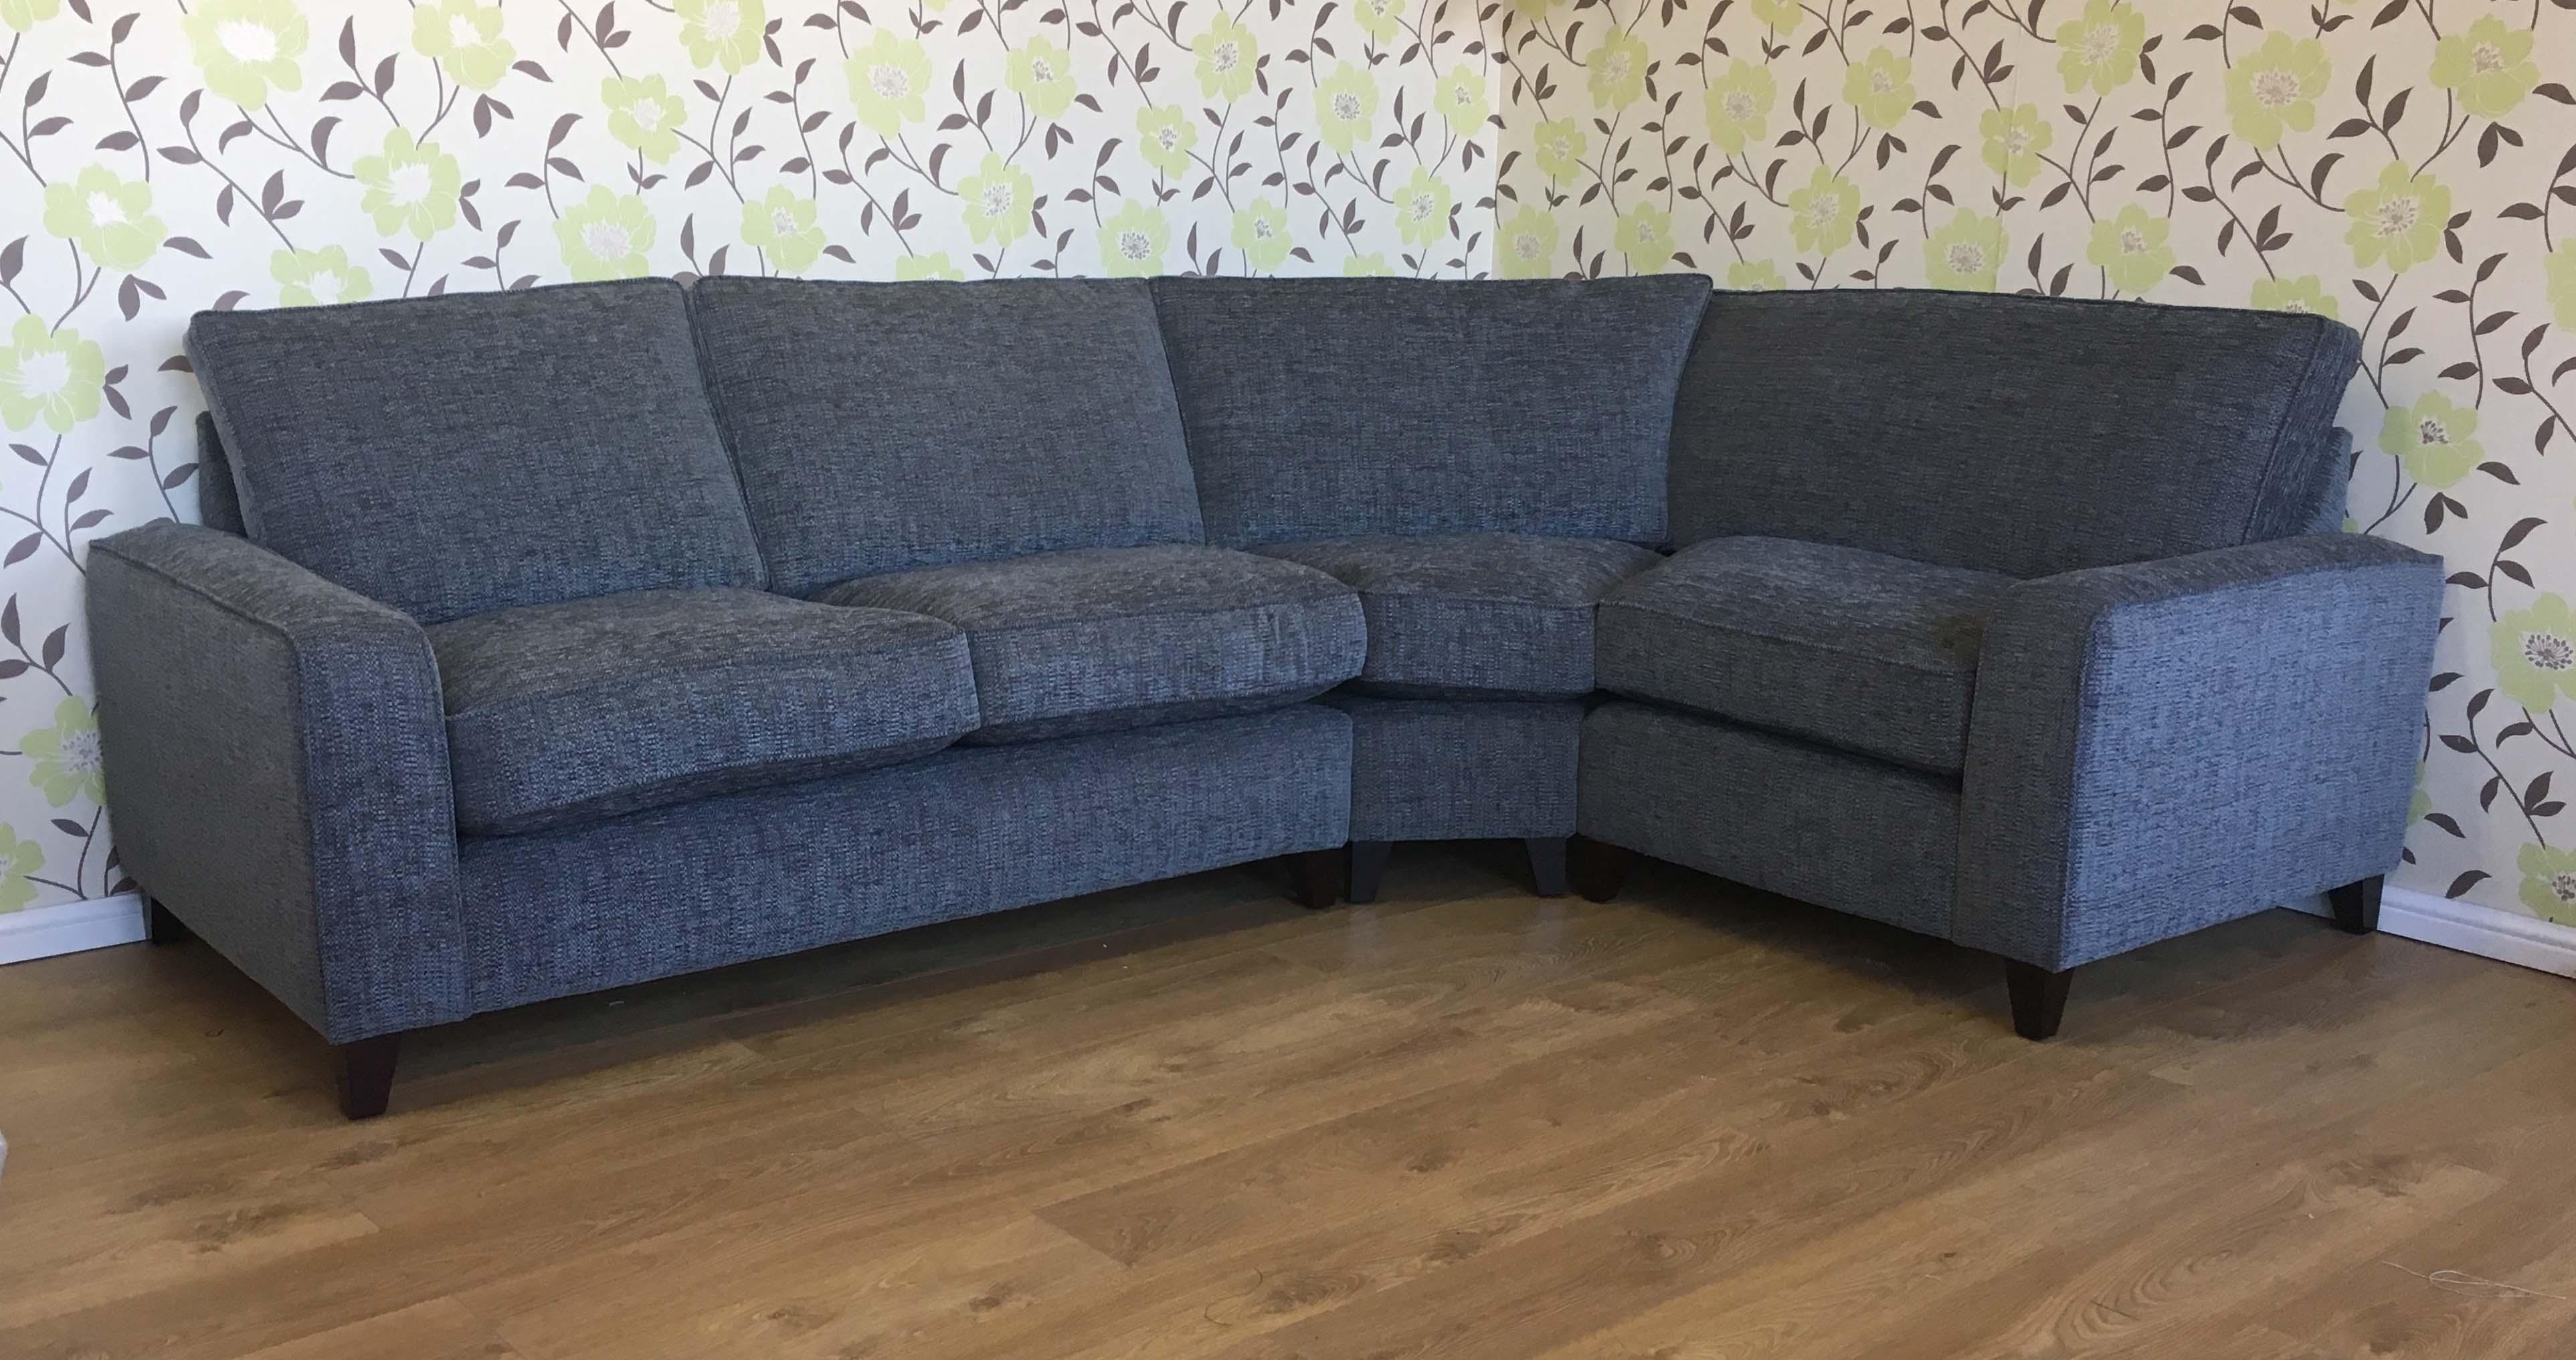 Cambridge Angled Corner Sofa Tailor Made Sofas